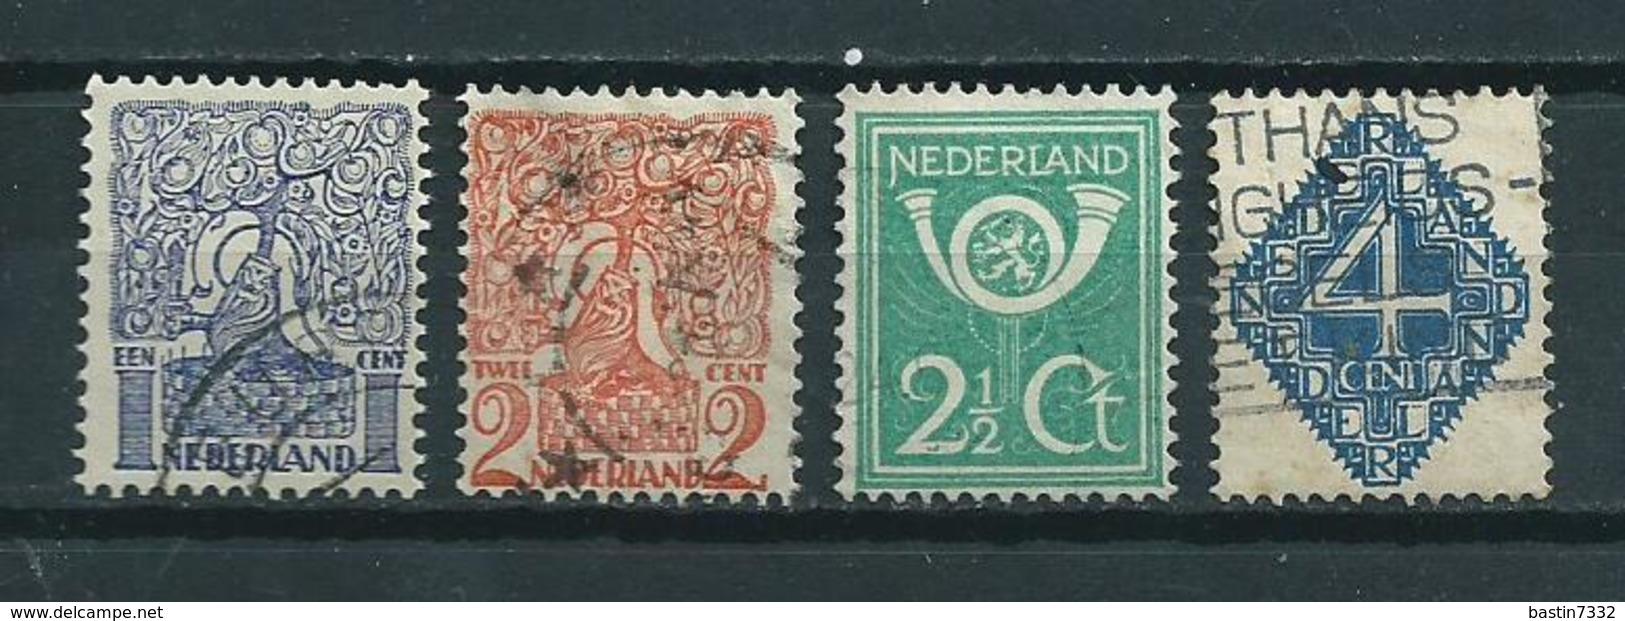 1923 Netherlands Complete Set Definitives Used/gebruikt/oblitere - Periode 1891-1948 (Wilhelmina)